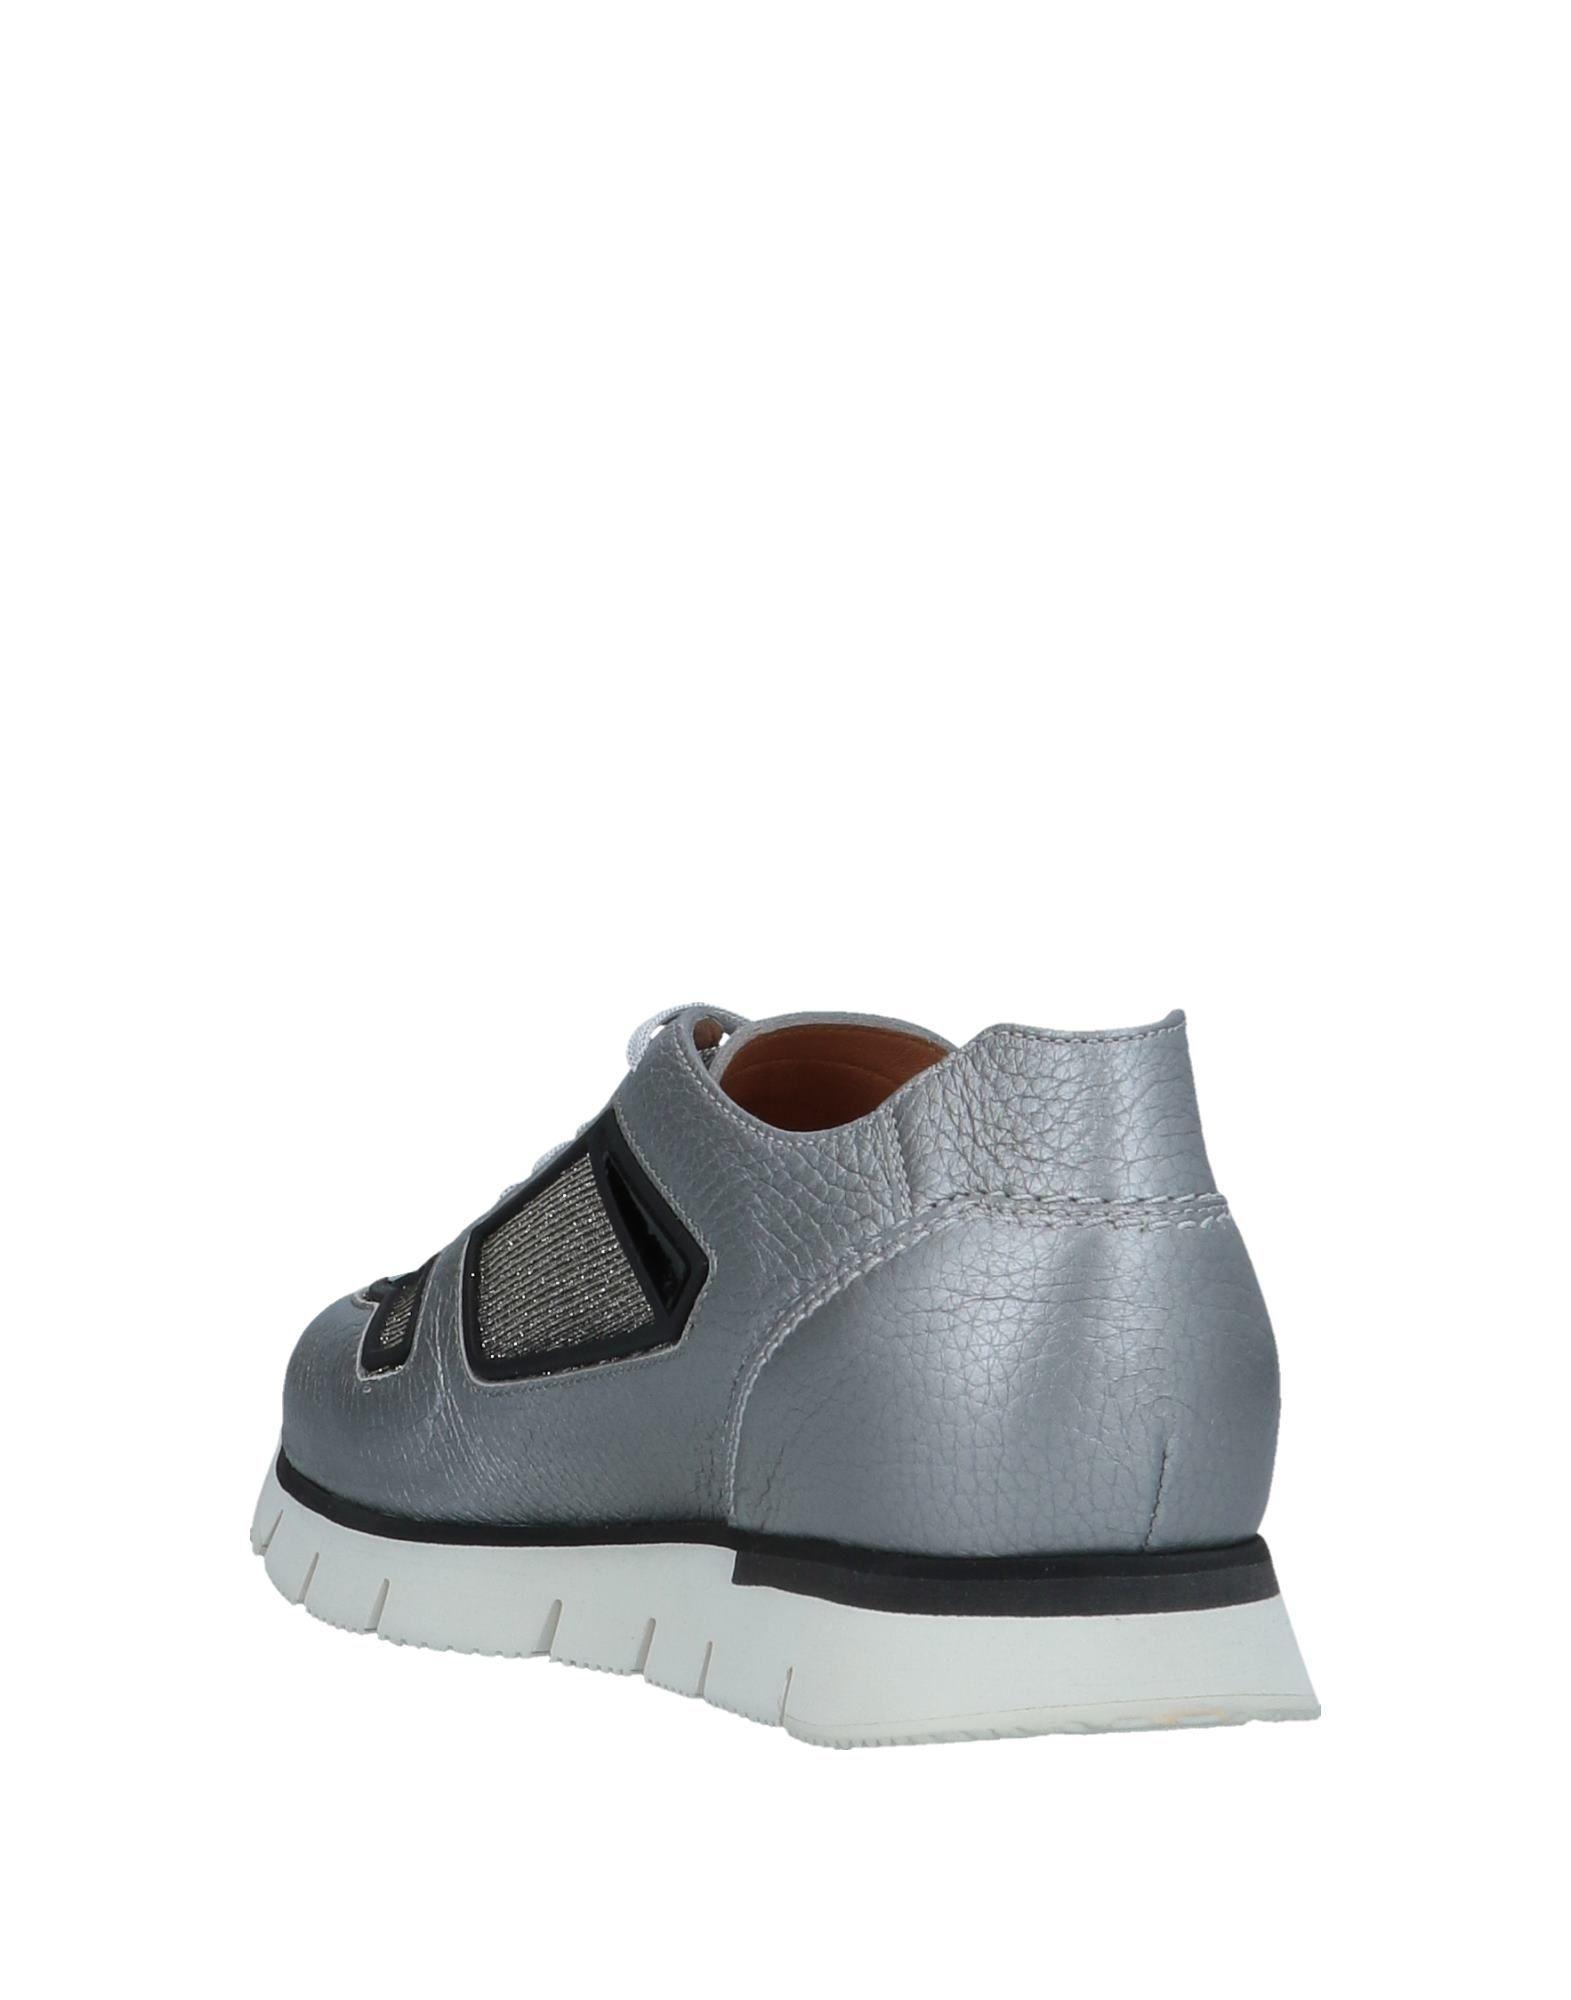 Santoni Sneakers - Women Santoni Sneakers online on    United Kingdom - 11539236GP 2e1a65